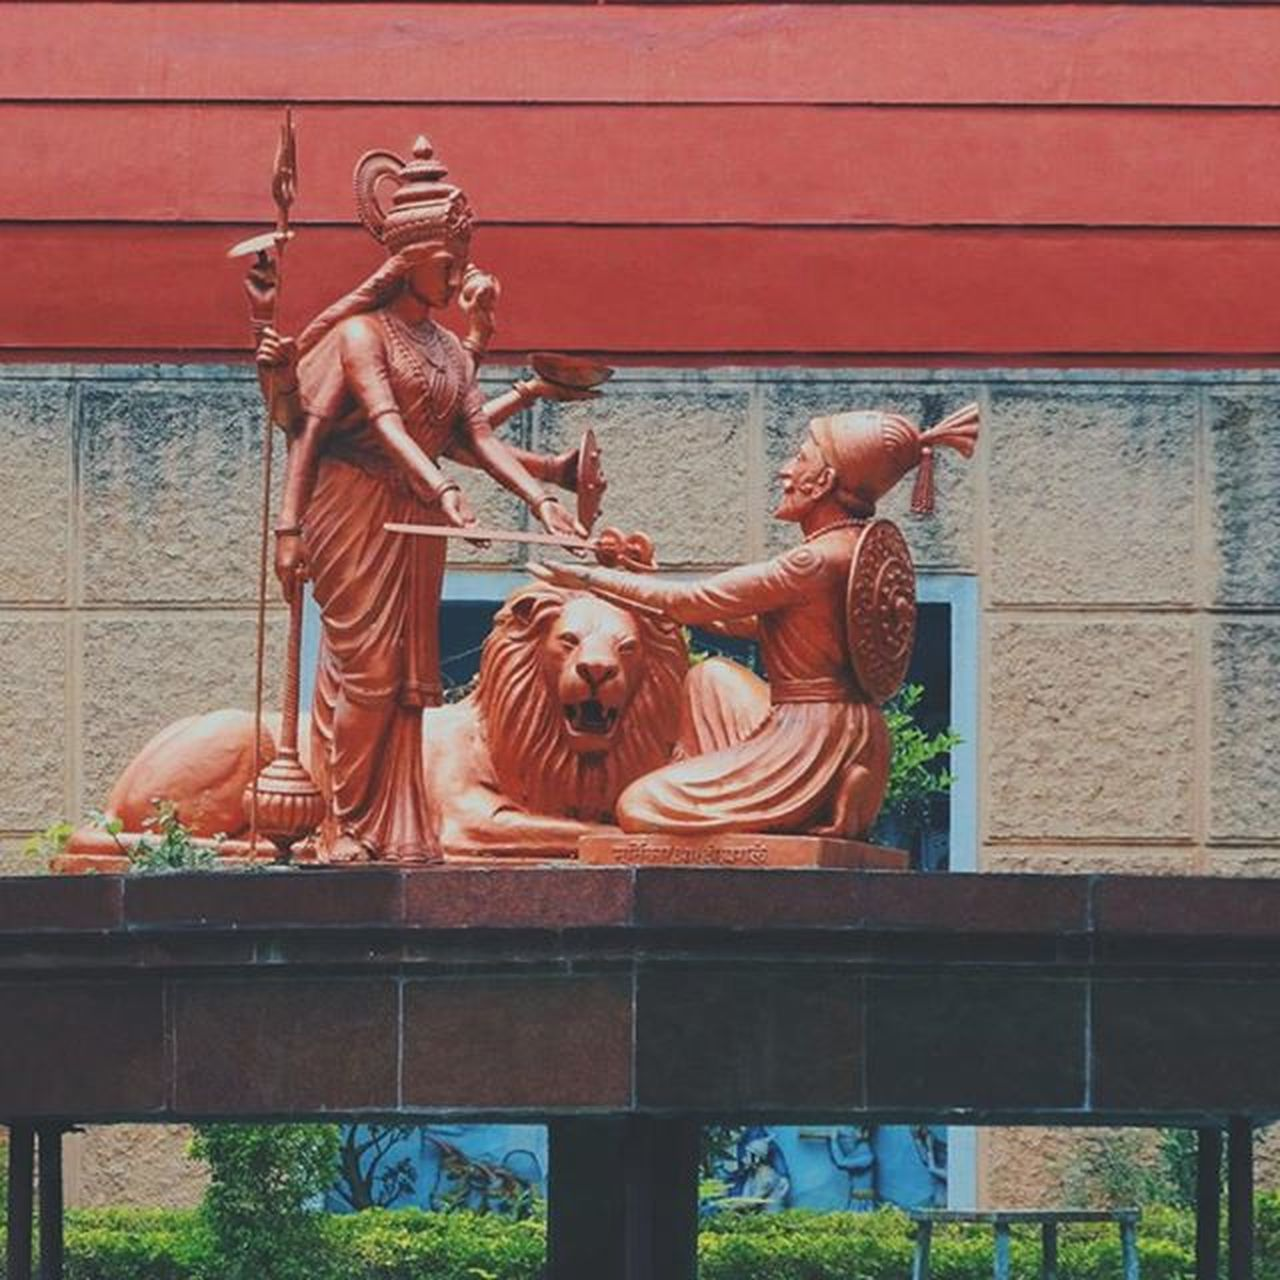 Shivaji Maharaj | Vscocam Maharashtra _soi Maratha Shivaji Voyagediaries Indiapictures India Photooftheday Instaindia Igers Igersindia Igersworldwide Wearevsco Vscolife Vscogang Vscouser Vscodailydose Vscocamonly VSCO Vscogallery Vscocollections Vscomood Vscobest